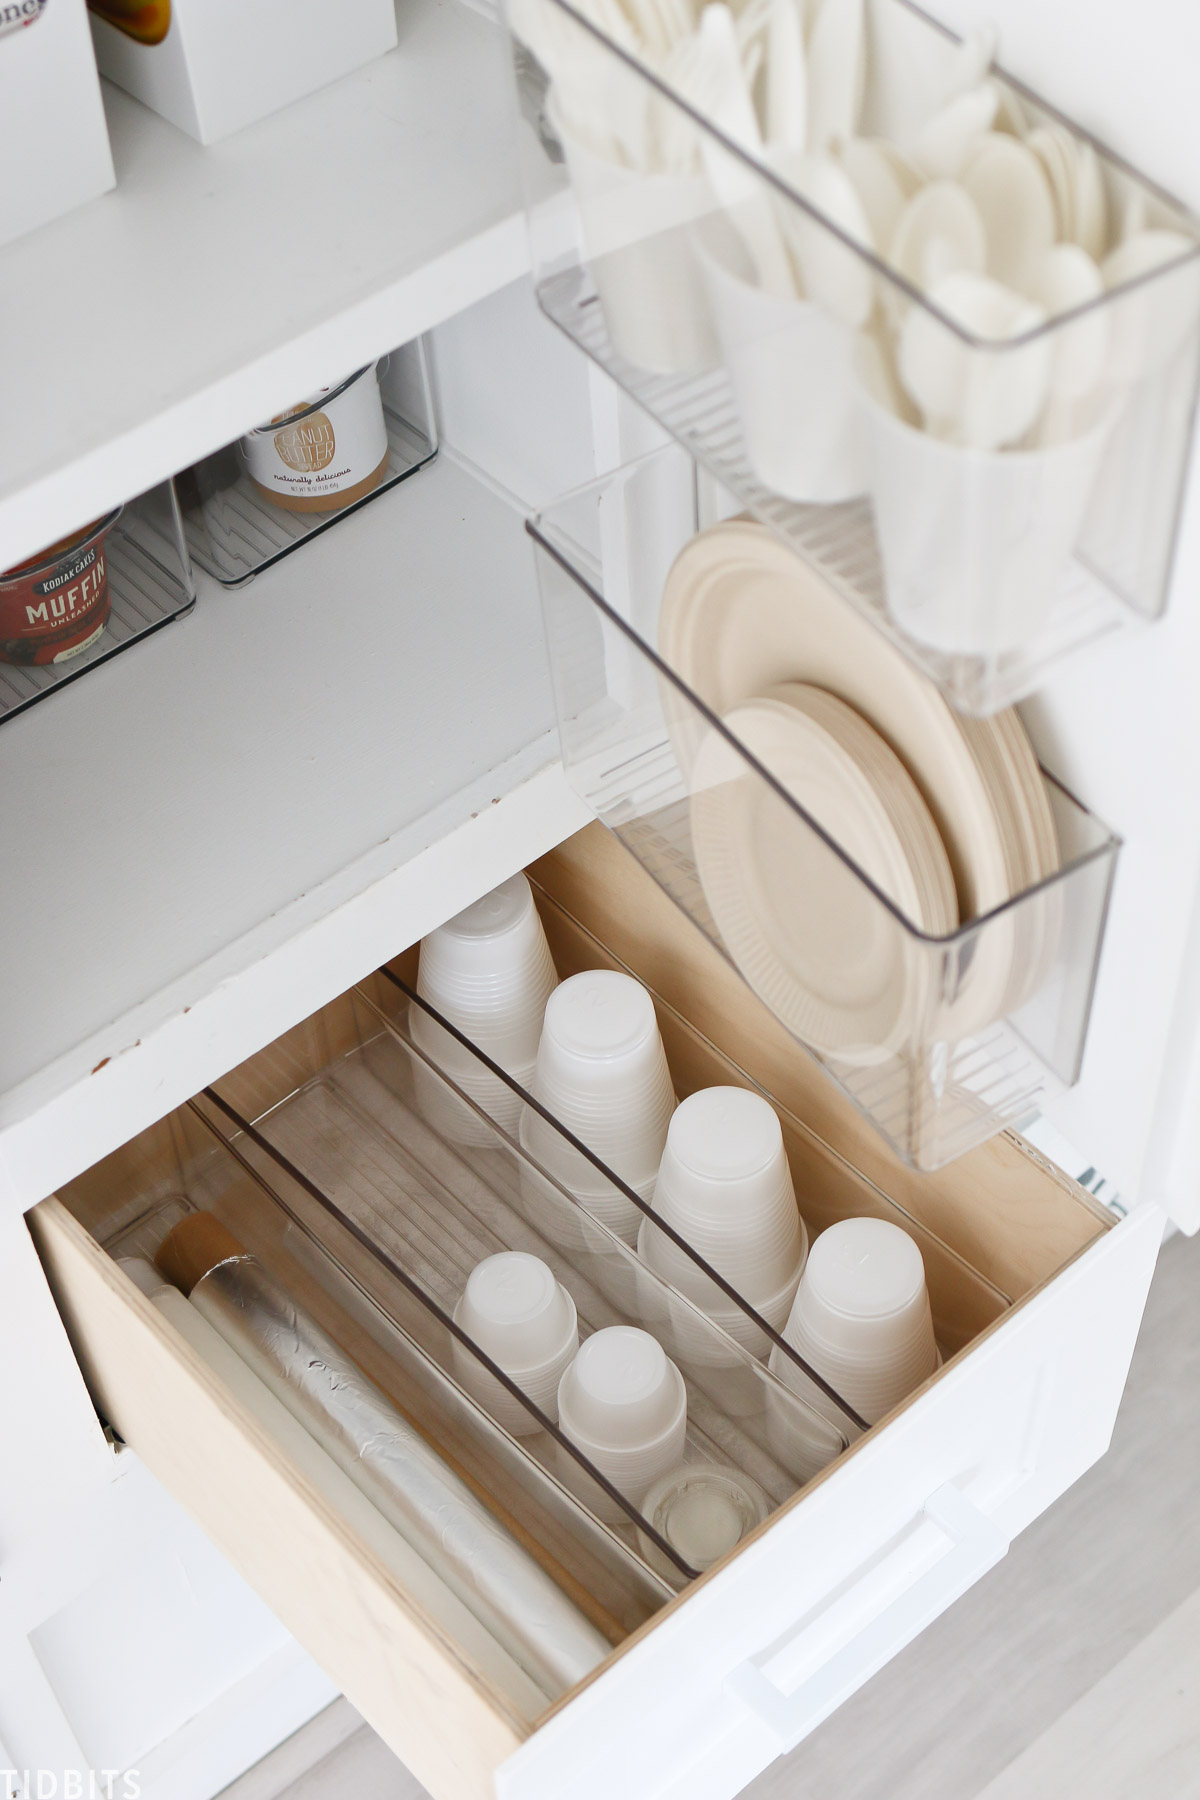 Paper product organization